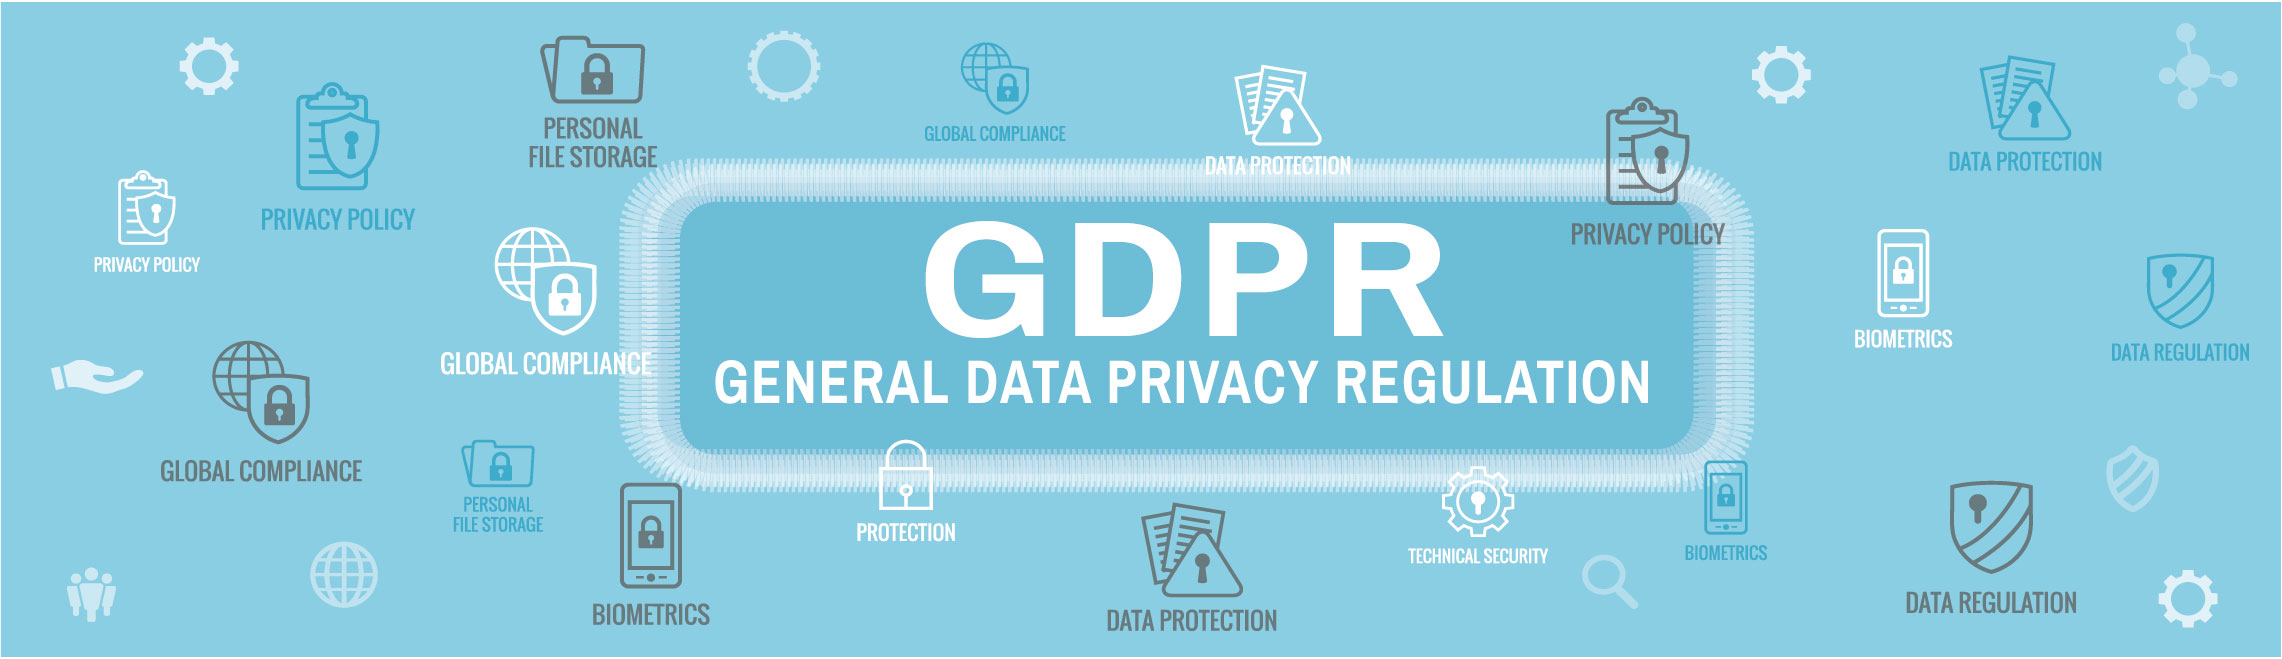 GDPR terms-1